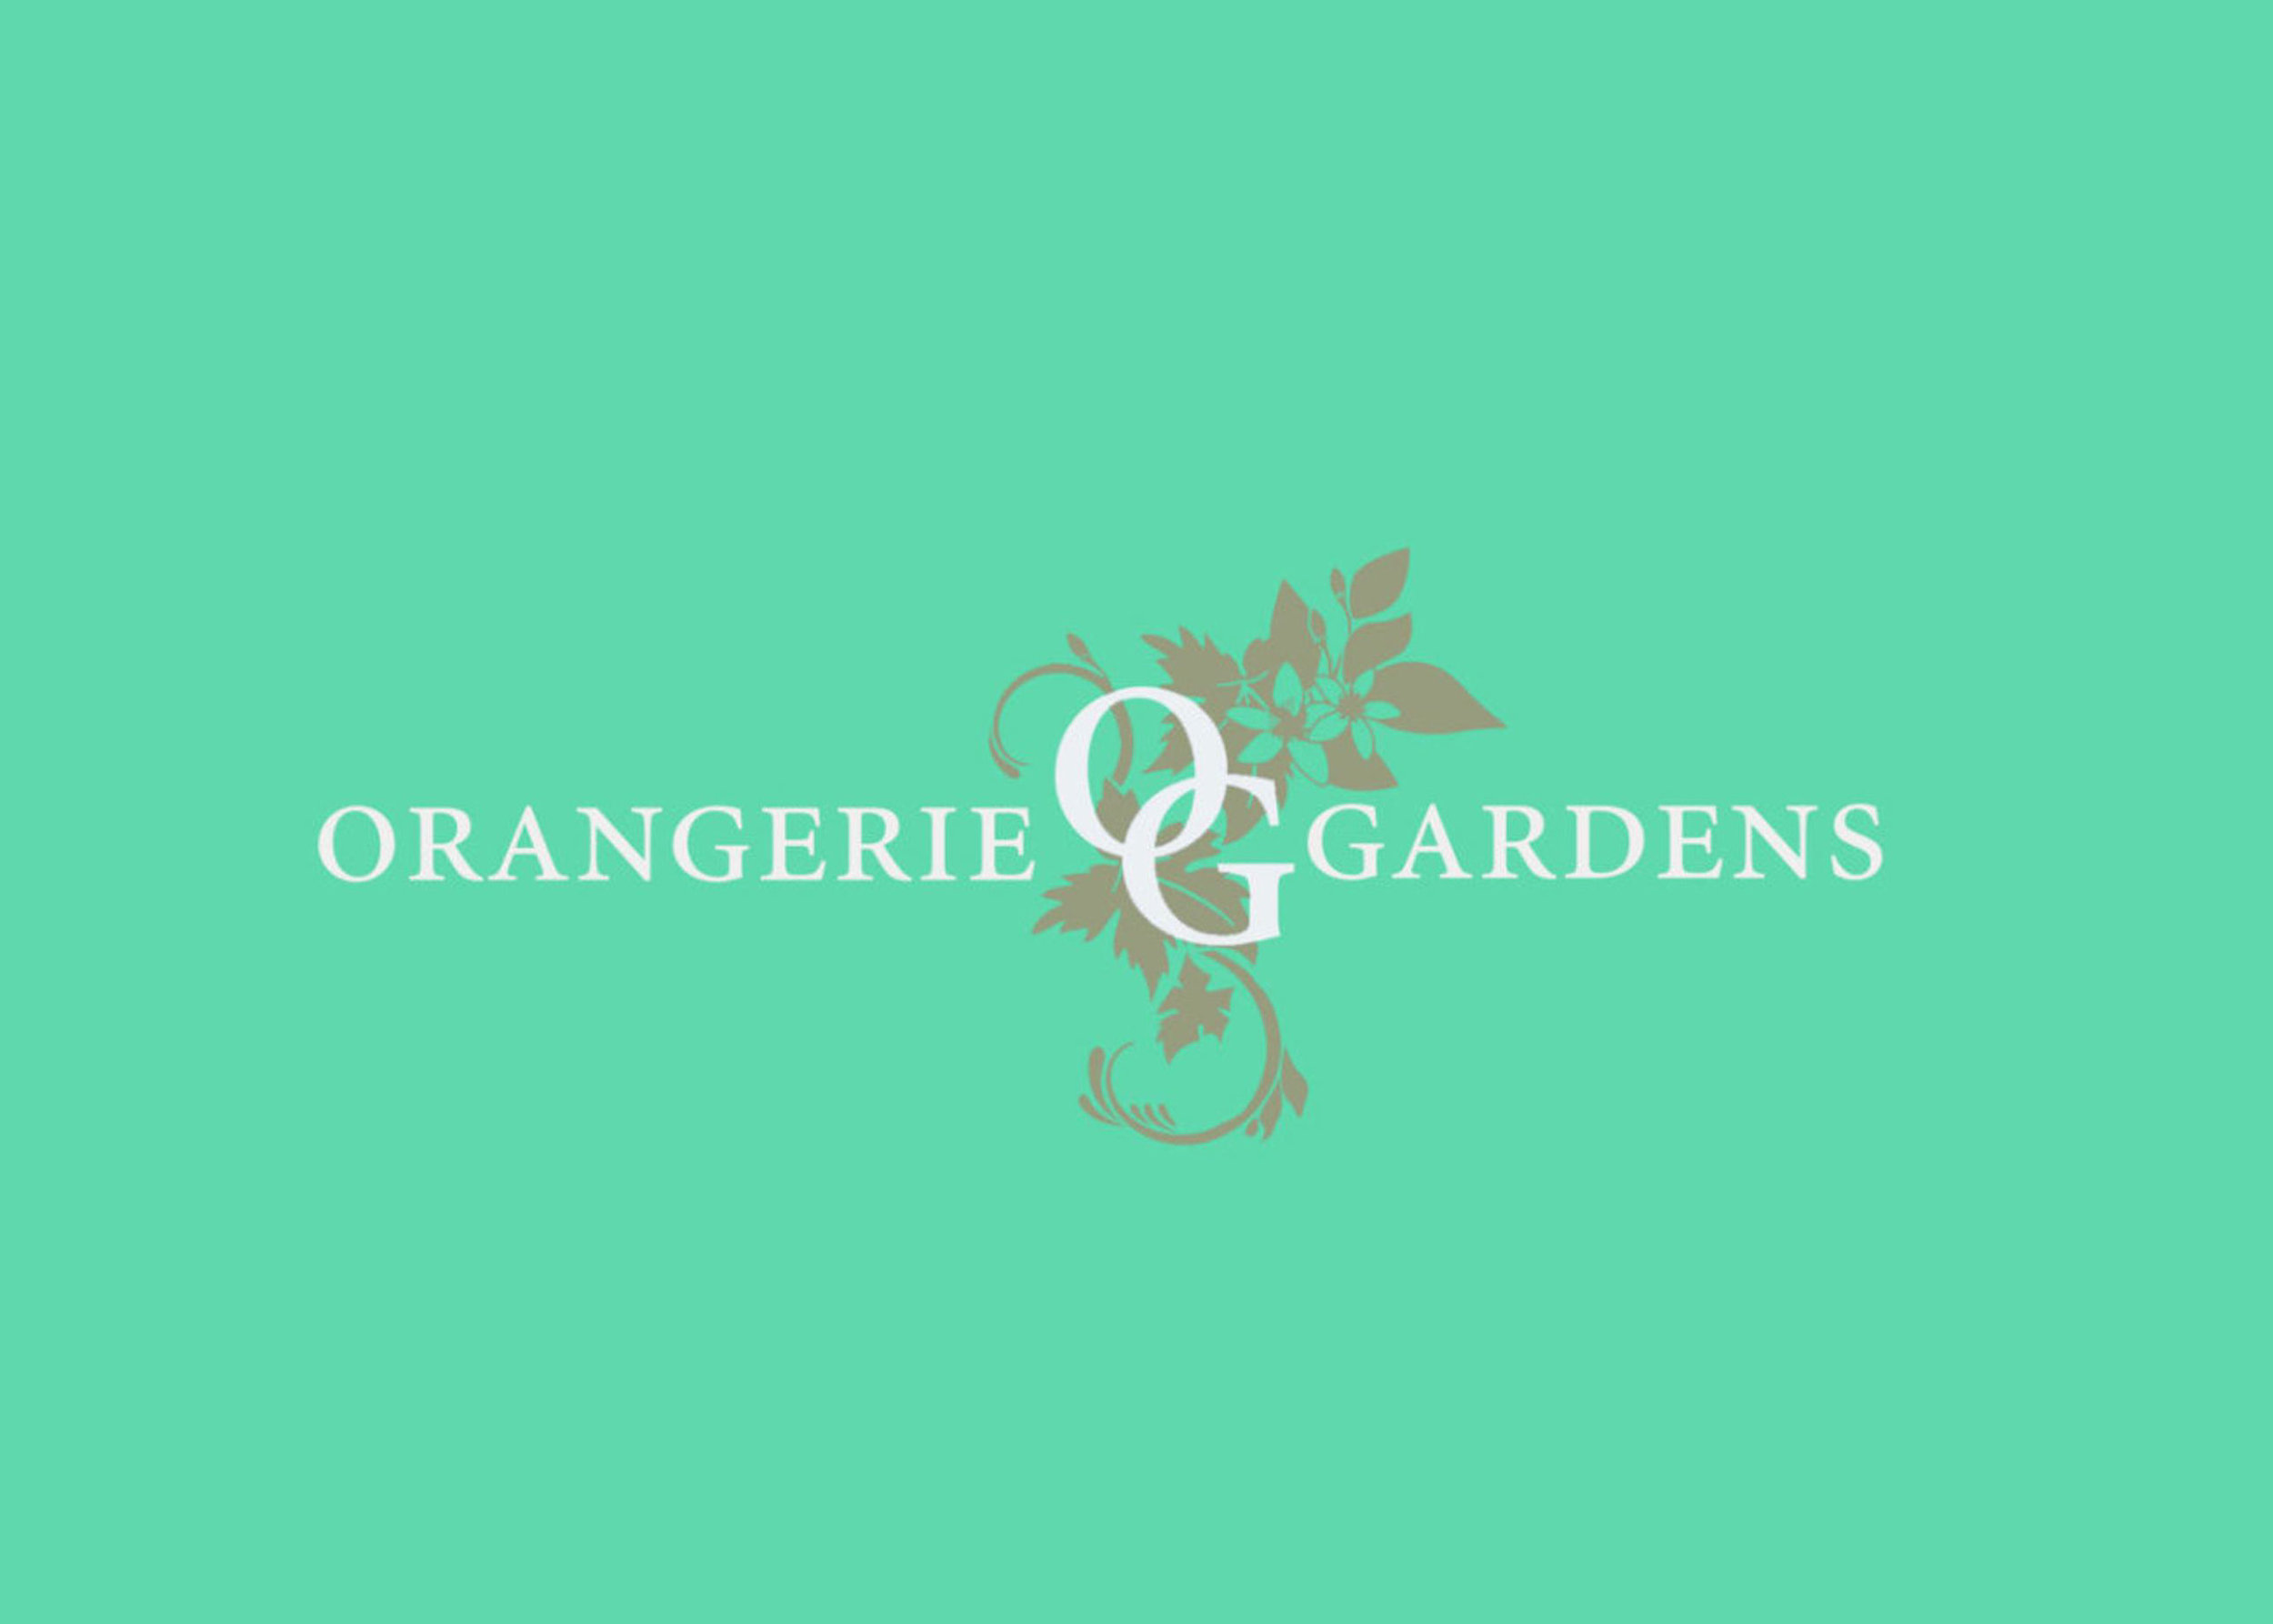 oranges-banner2.jpg